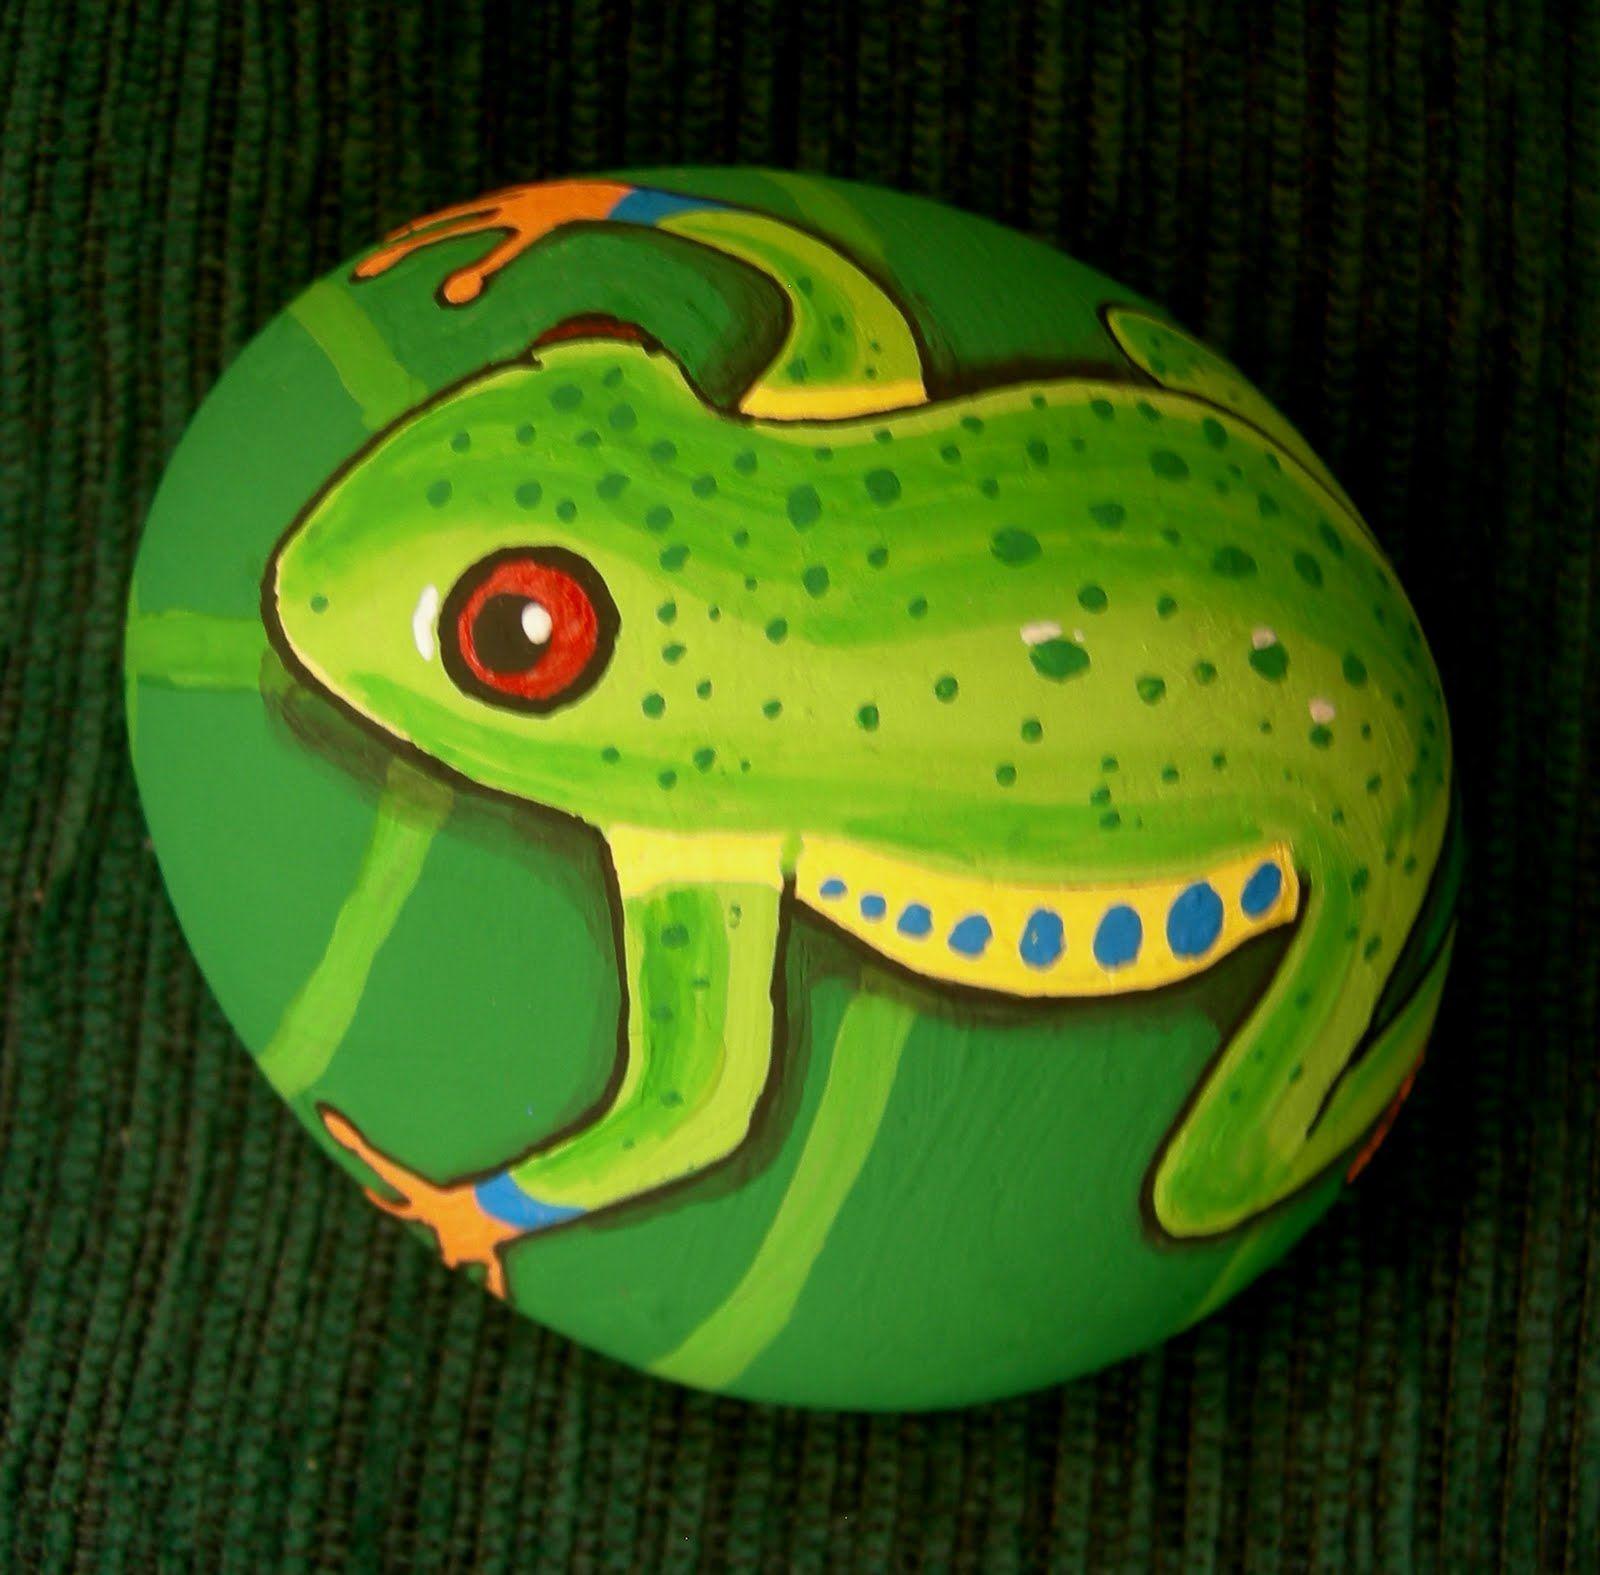 Kedibu murales y objetos decorativos piedras pintadas - Objetos decorativos ...